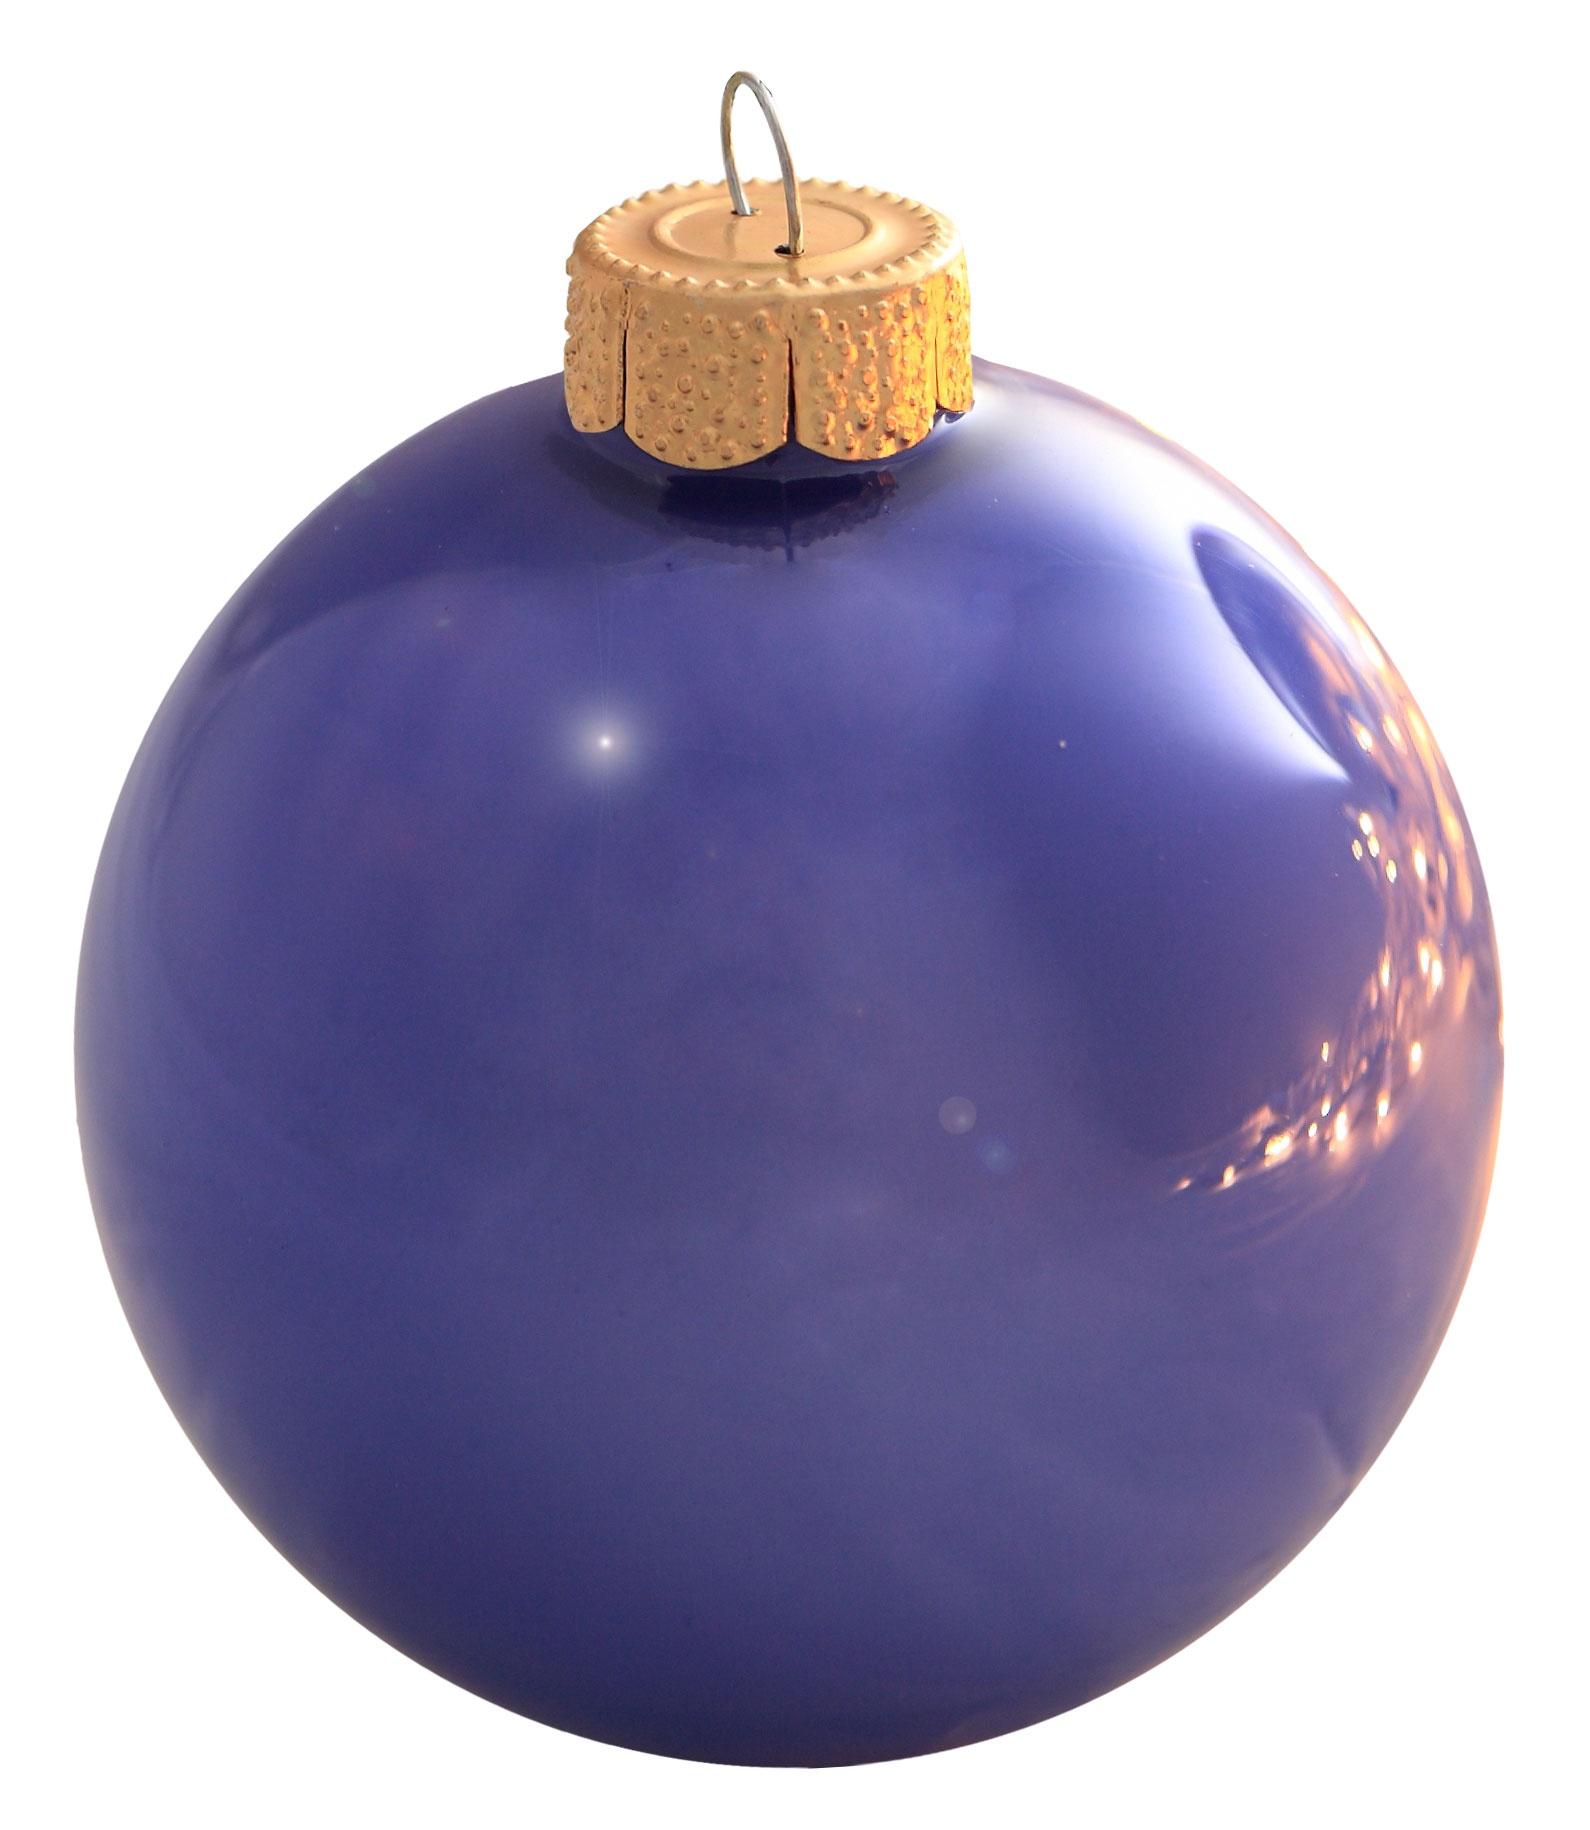 Home    Christmas Decorations    Christmas Ornaments    Christmas Ball u2DET1Q2